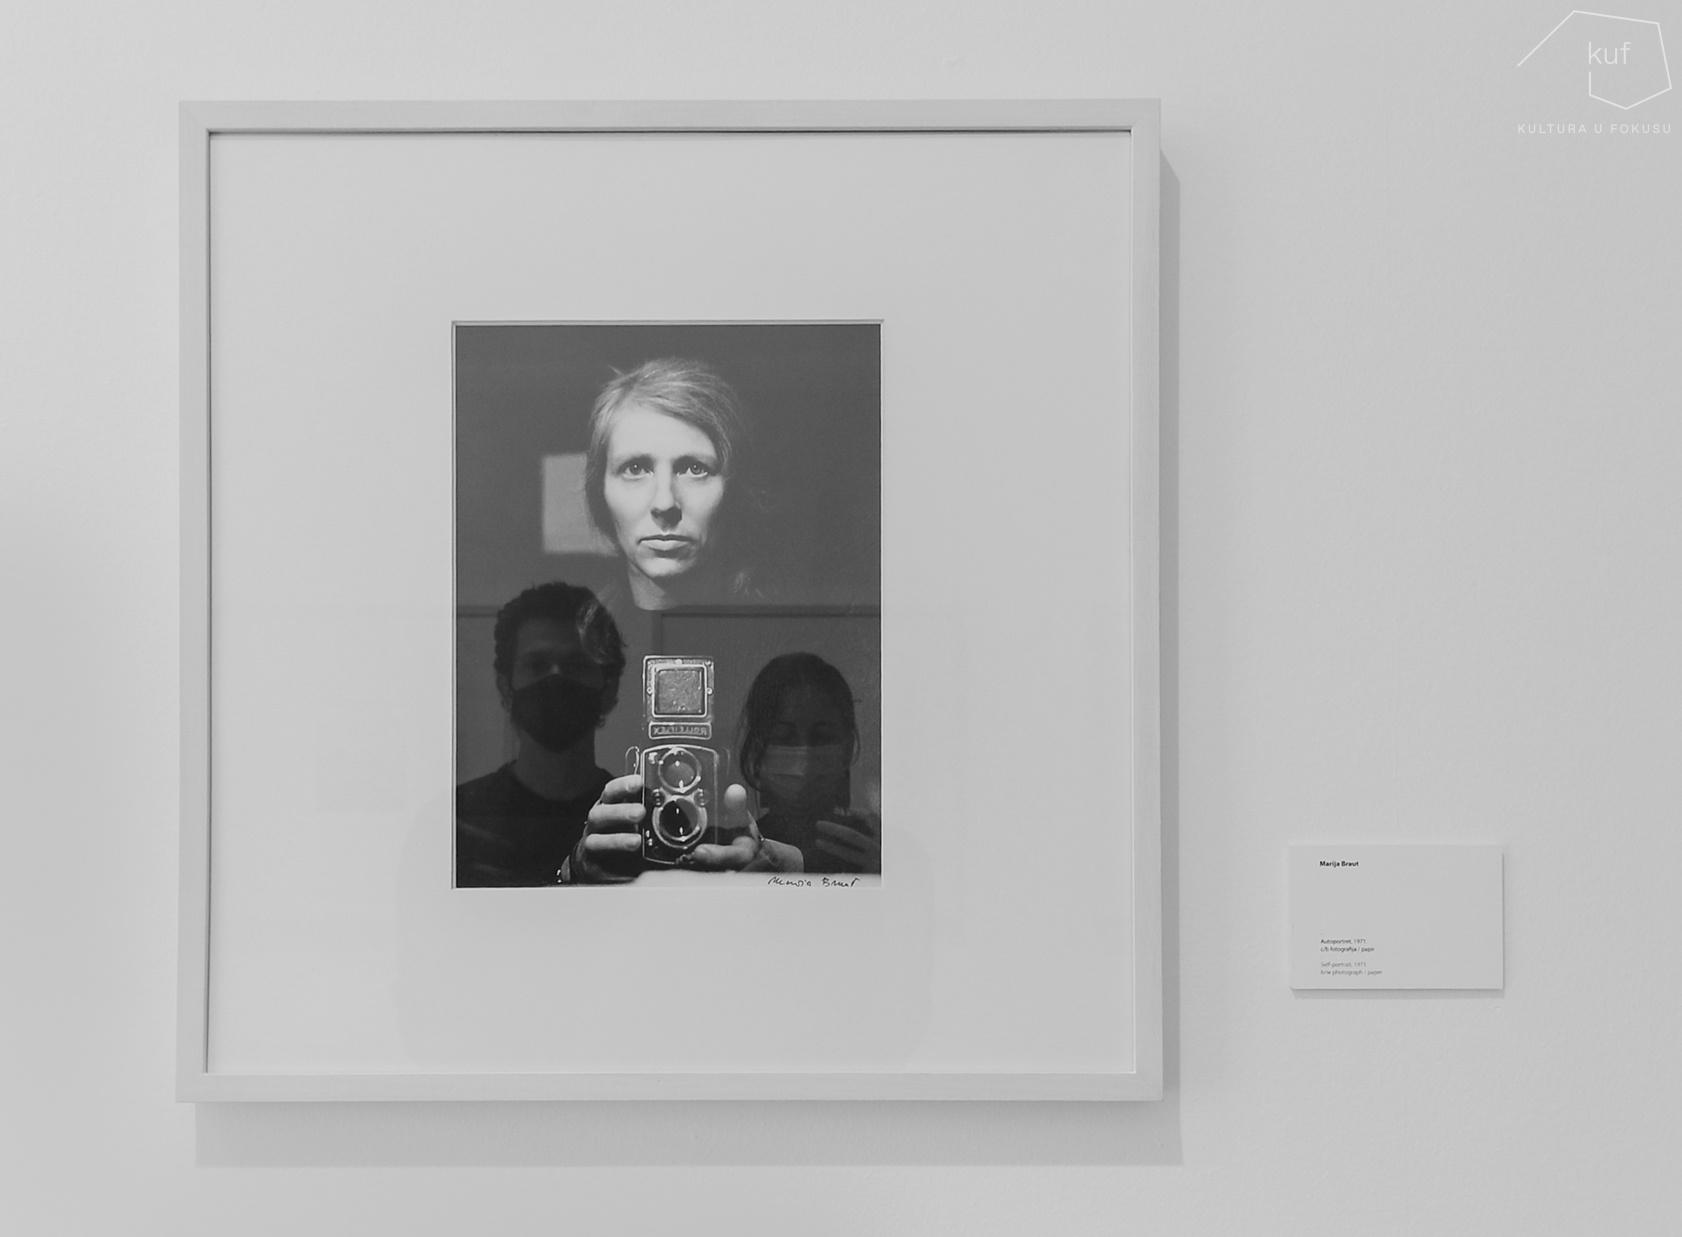 Portret i autoportret u portretu autoportreta